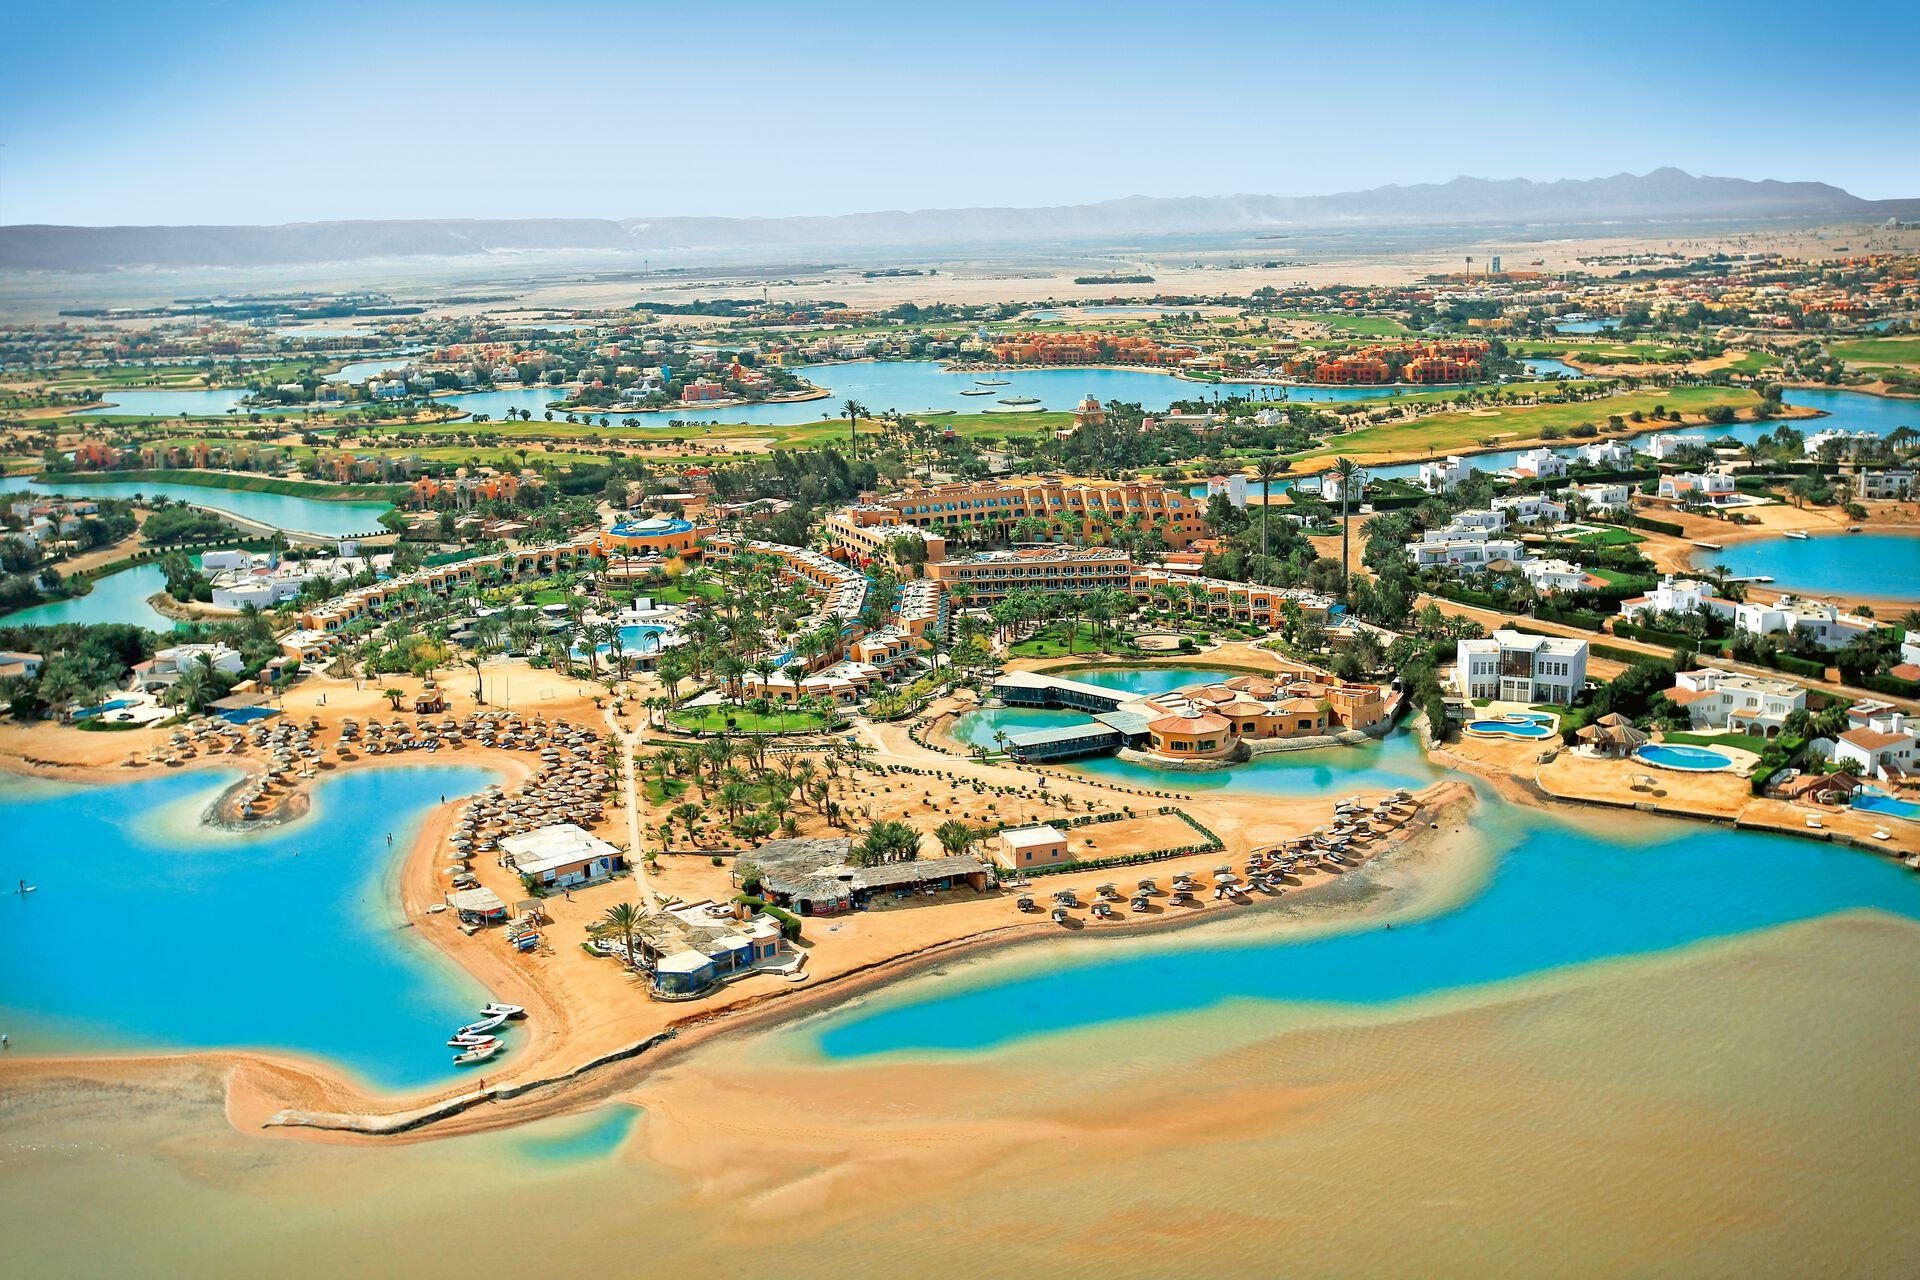 LABRANDA Club Paradisio El Gouna, Red Sea